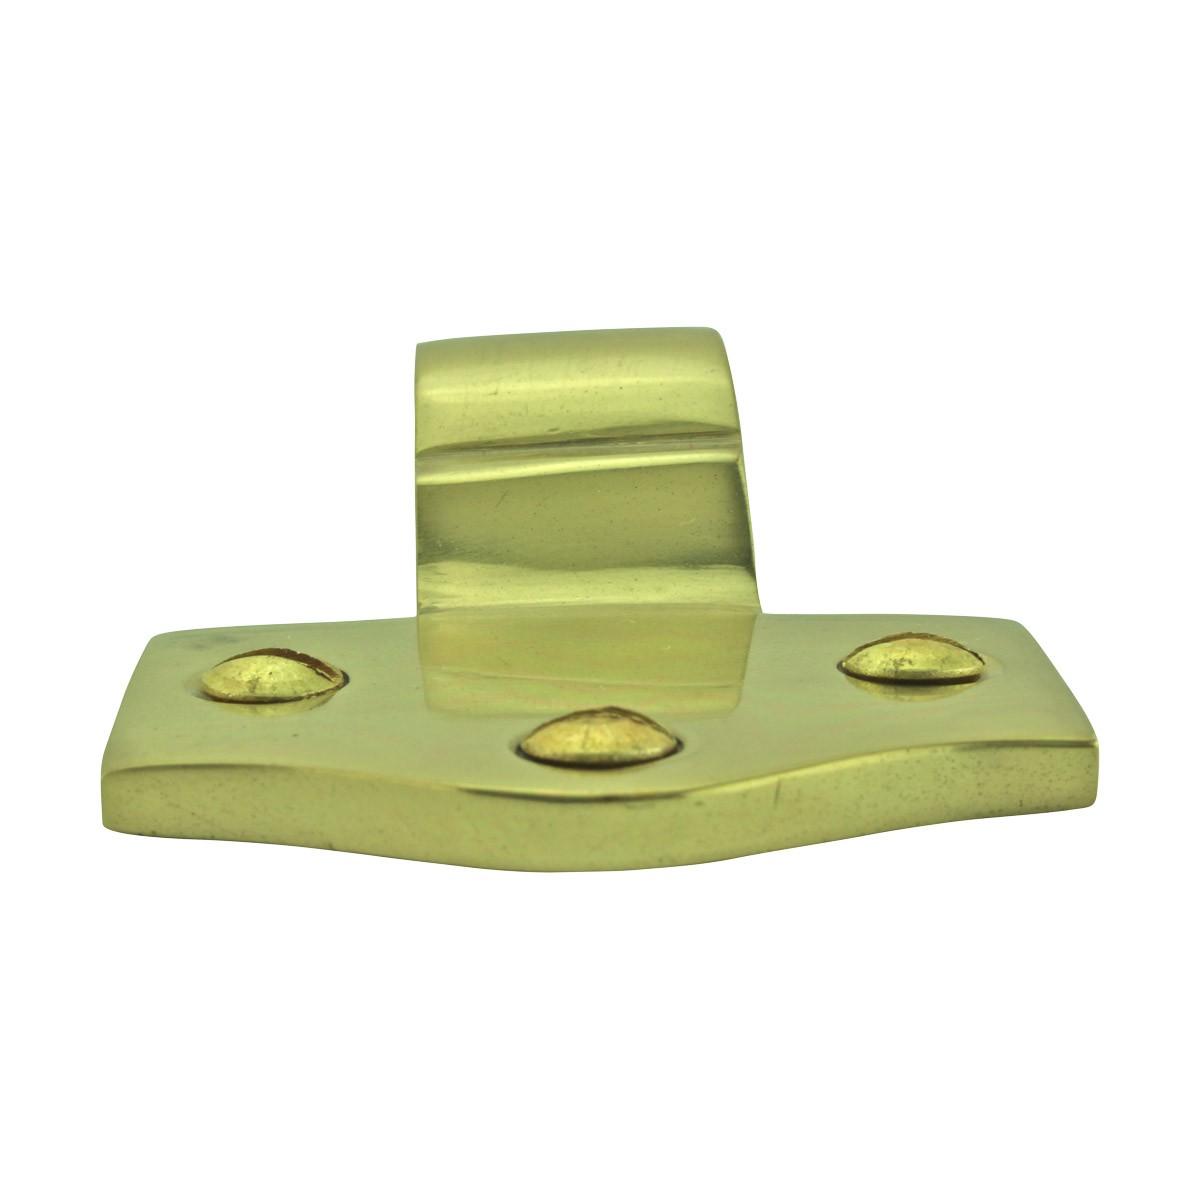 4 Sash Lift Solid Brass Offset Eye Window Pulls Window Lifts Sash Lift